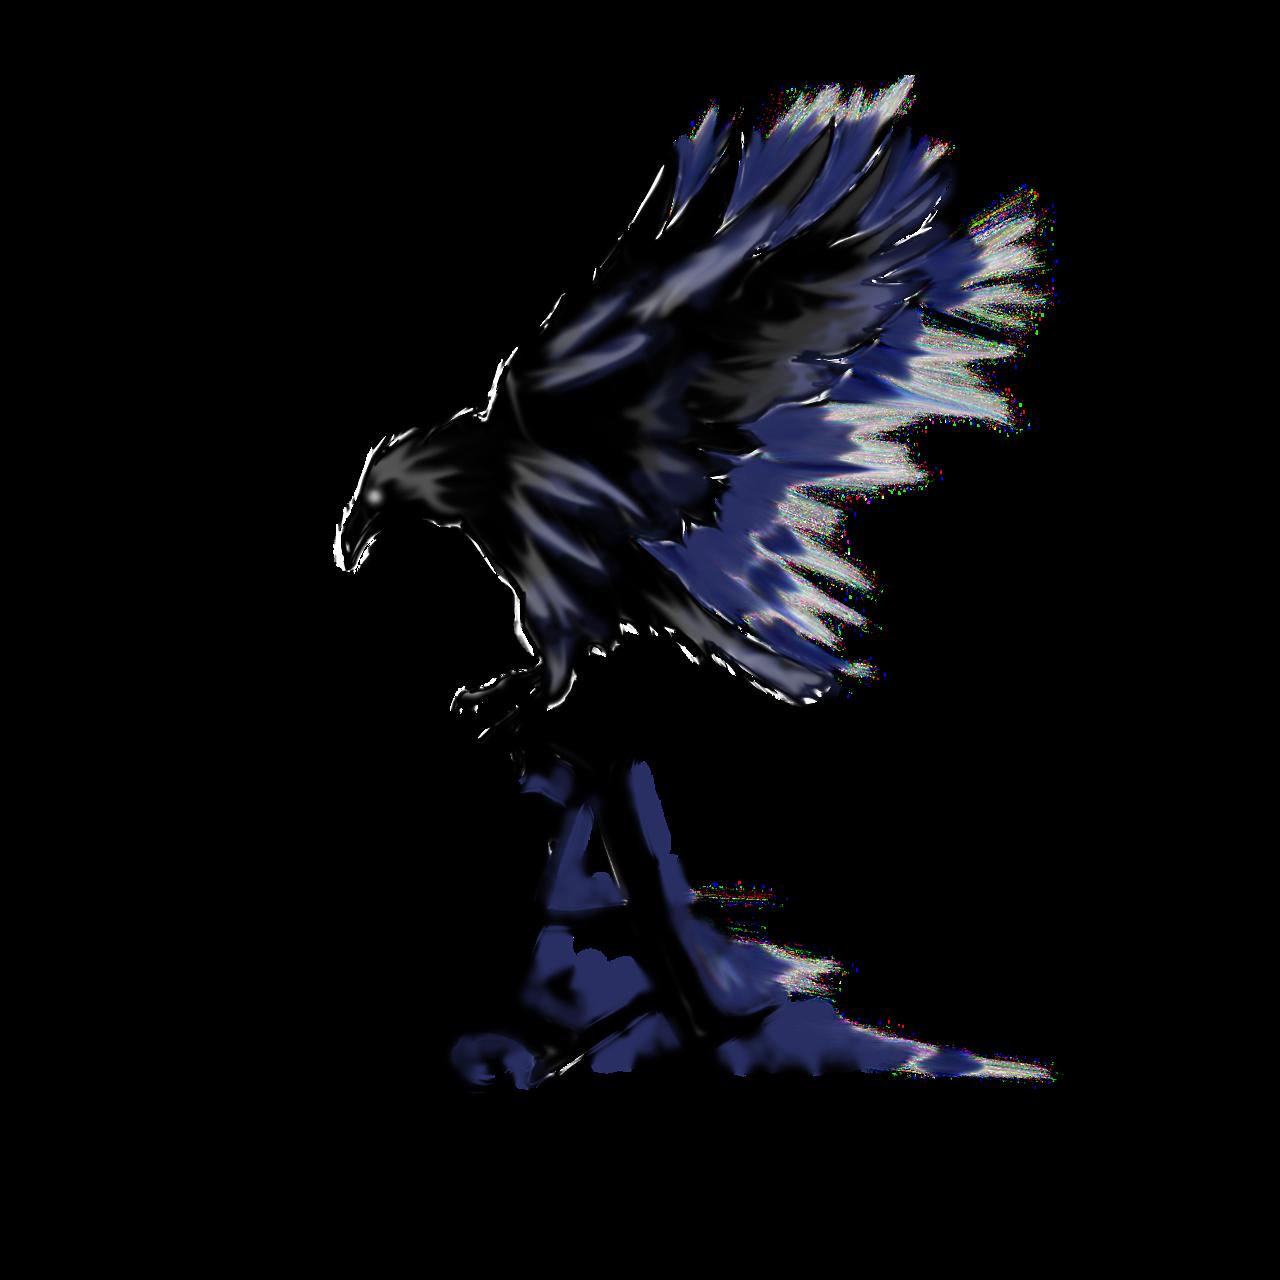 Raven Crest or Sigil made by Dworvin